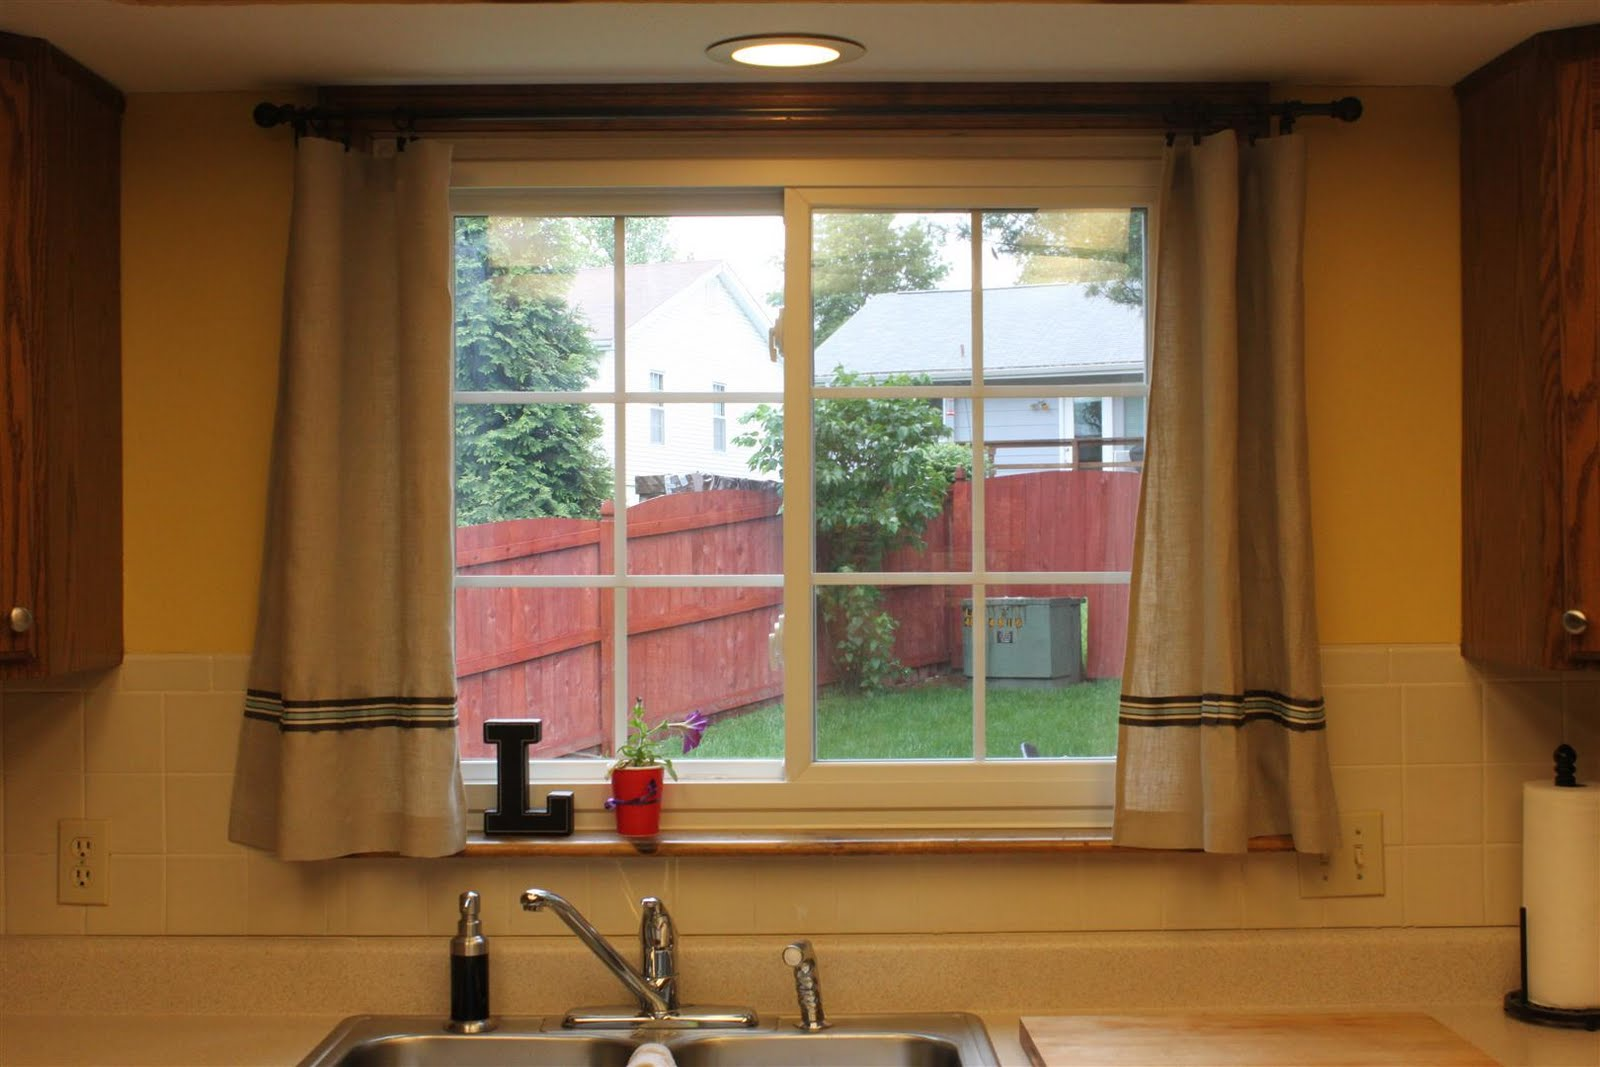 Kitchen Valances For Windows Best Islands 645 Workshop By The Crafty Cpa Work In Progress